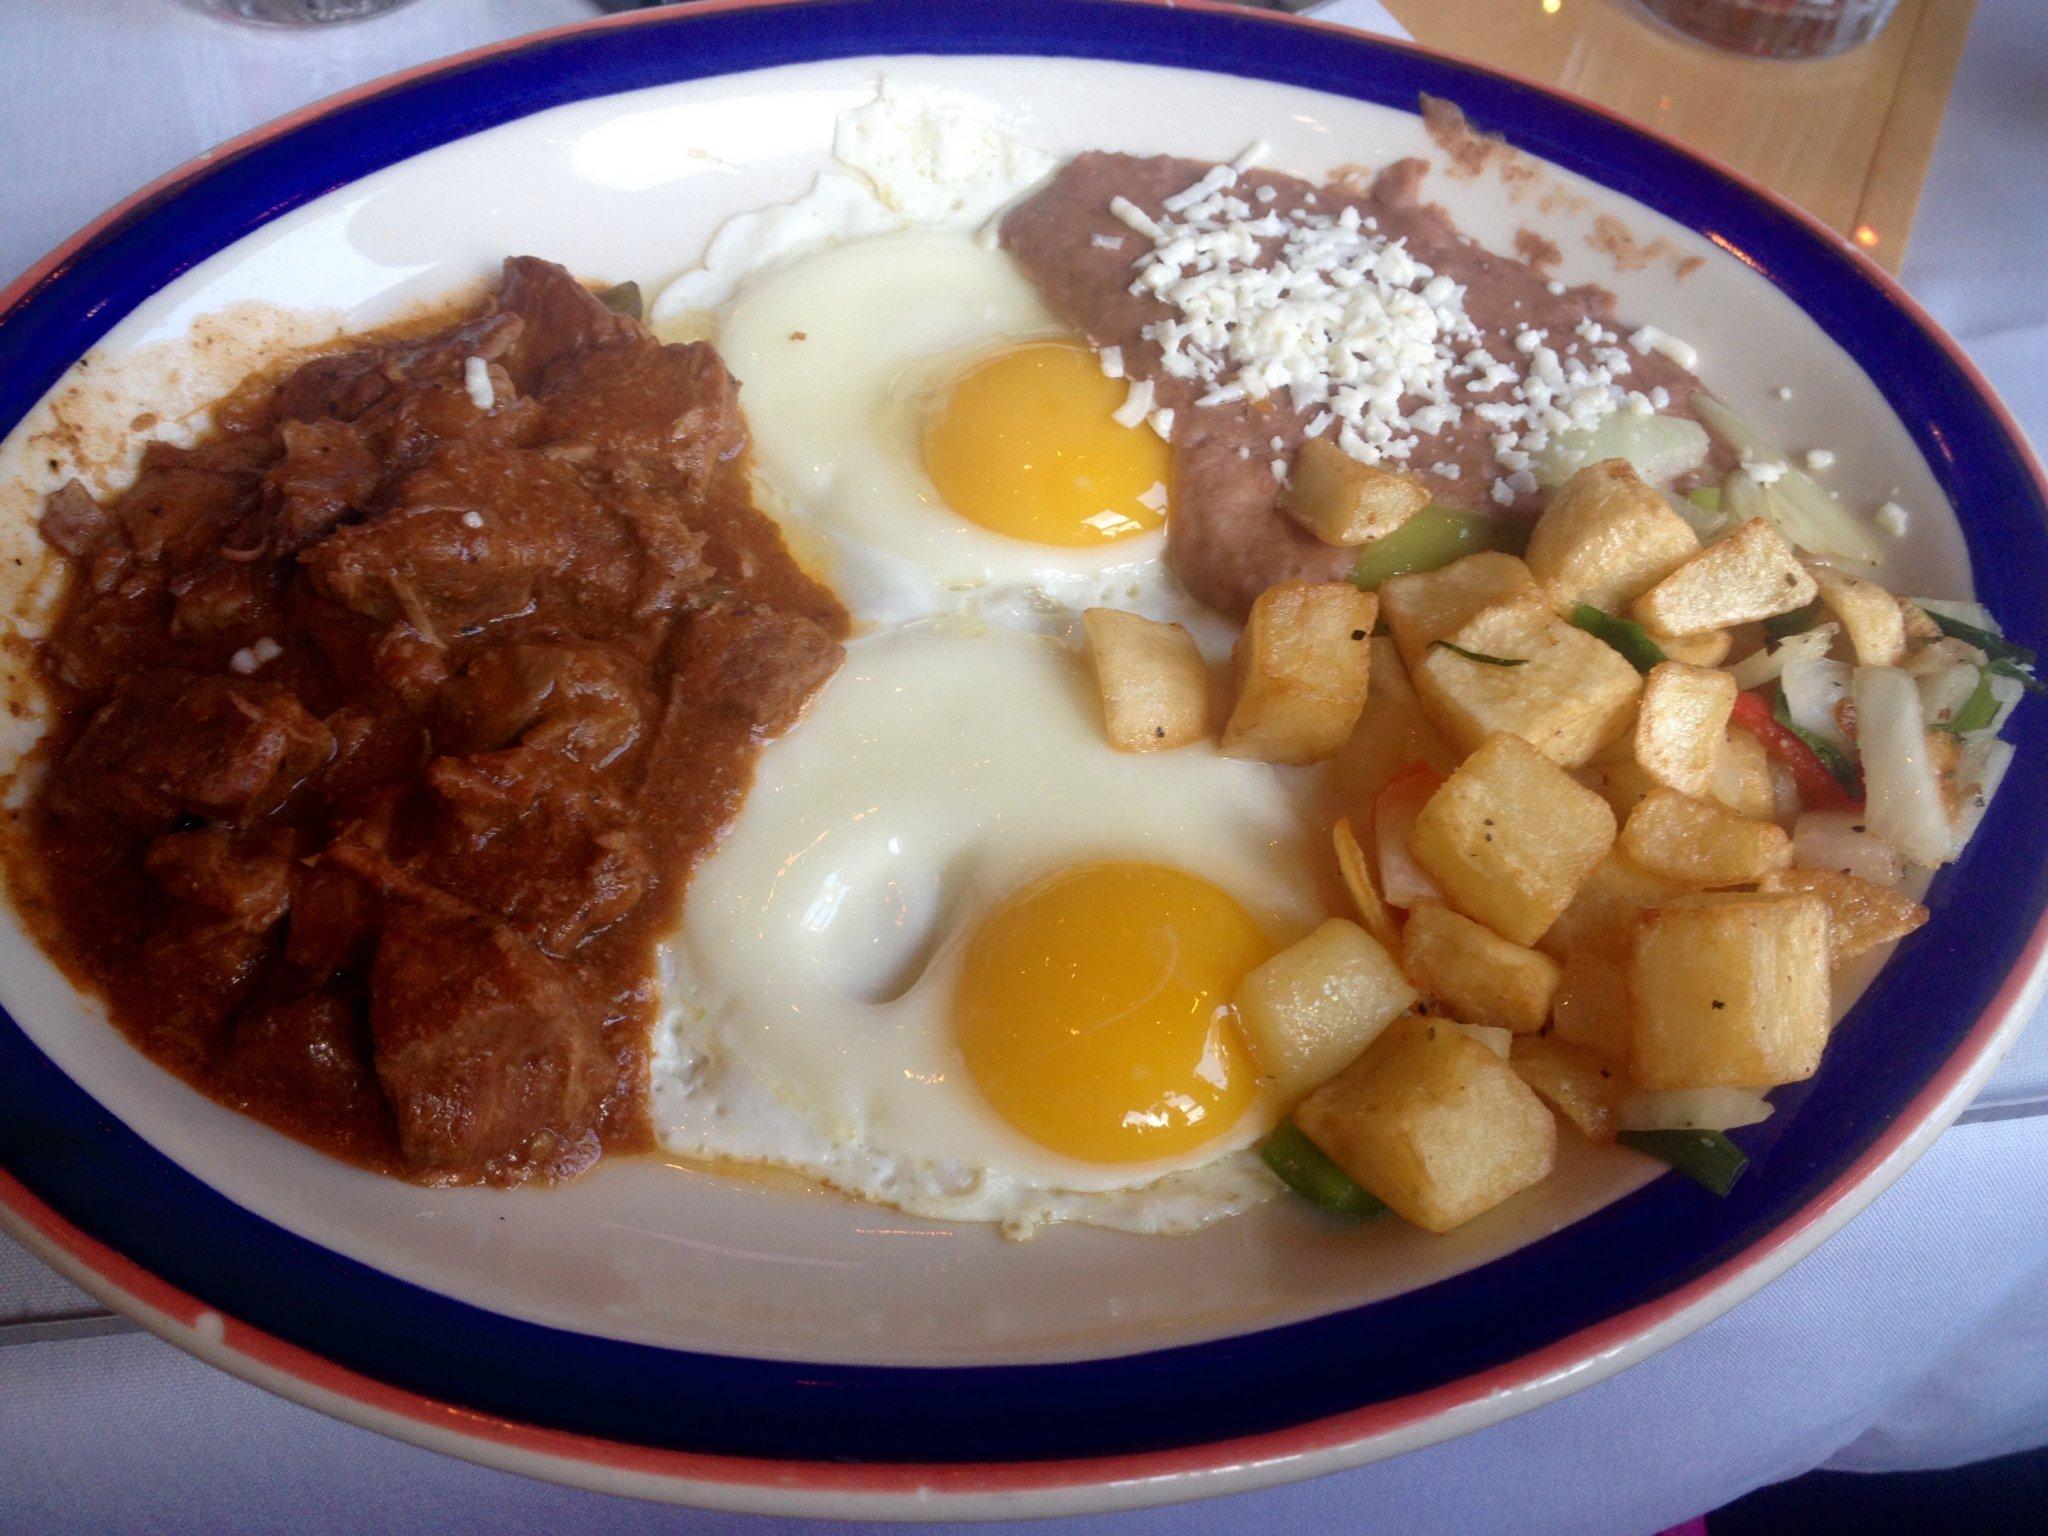 River Walk Restaurants: Special Mi Tierra Breakfast is served at Mi Tierra, by the river walk